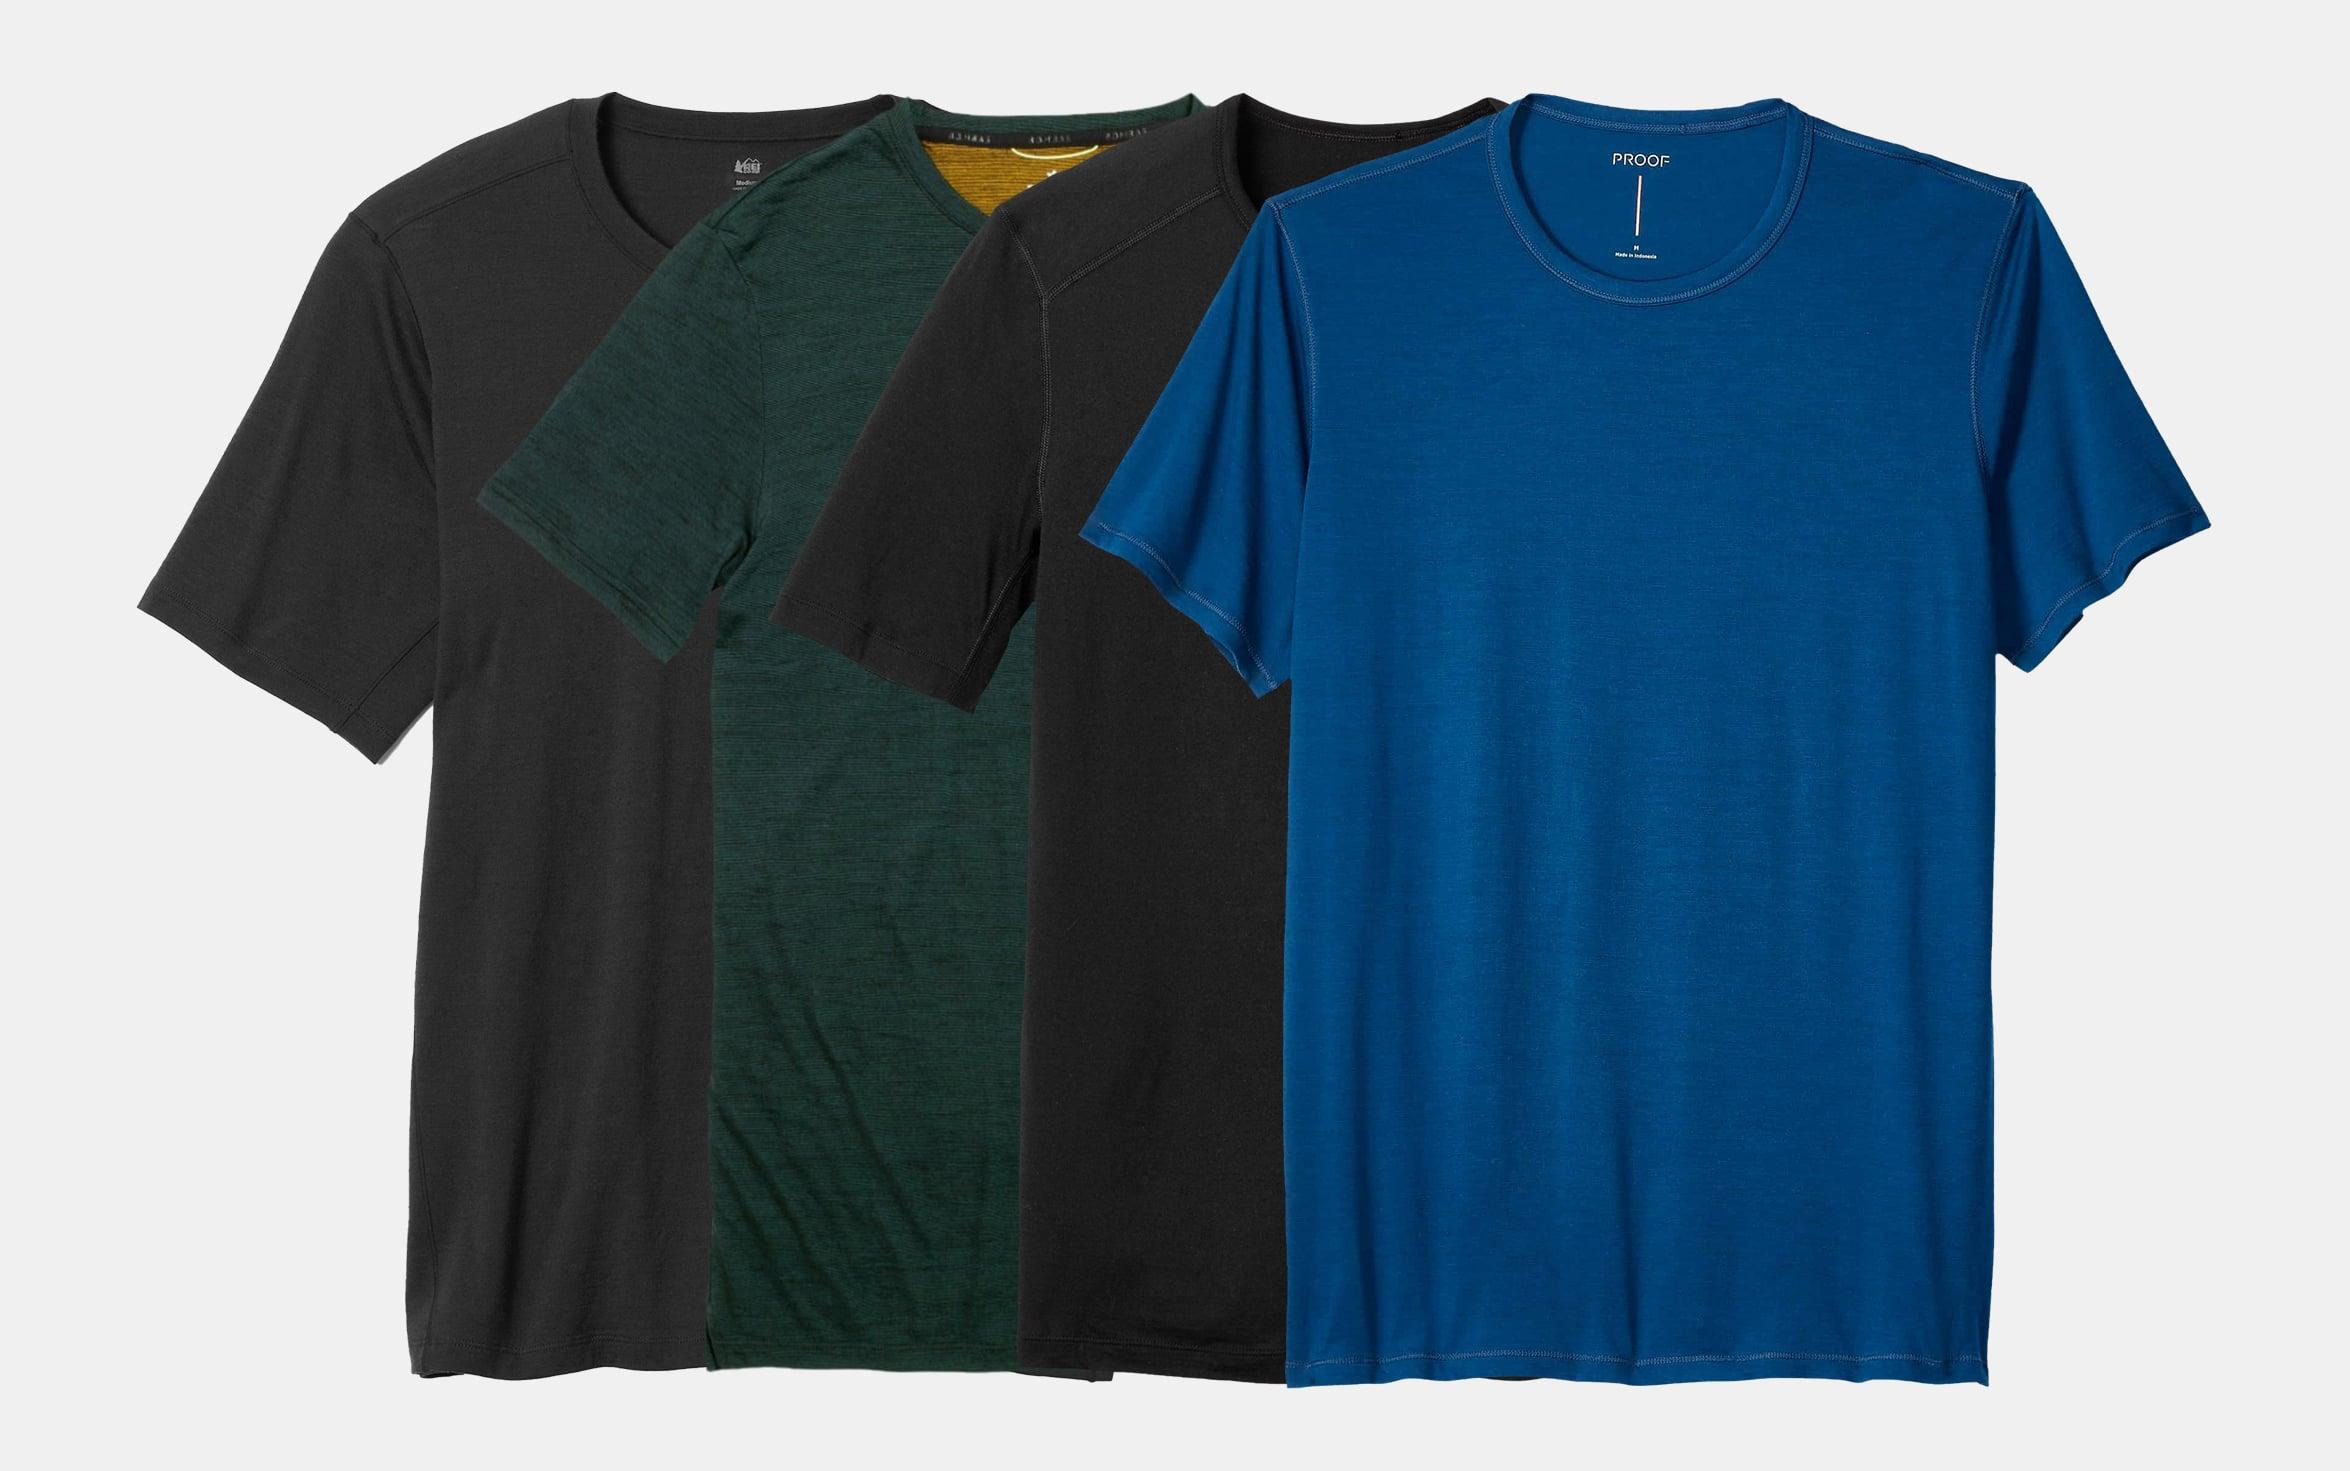 Best Merino Wool T-Shirts for Men